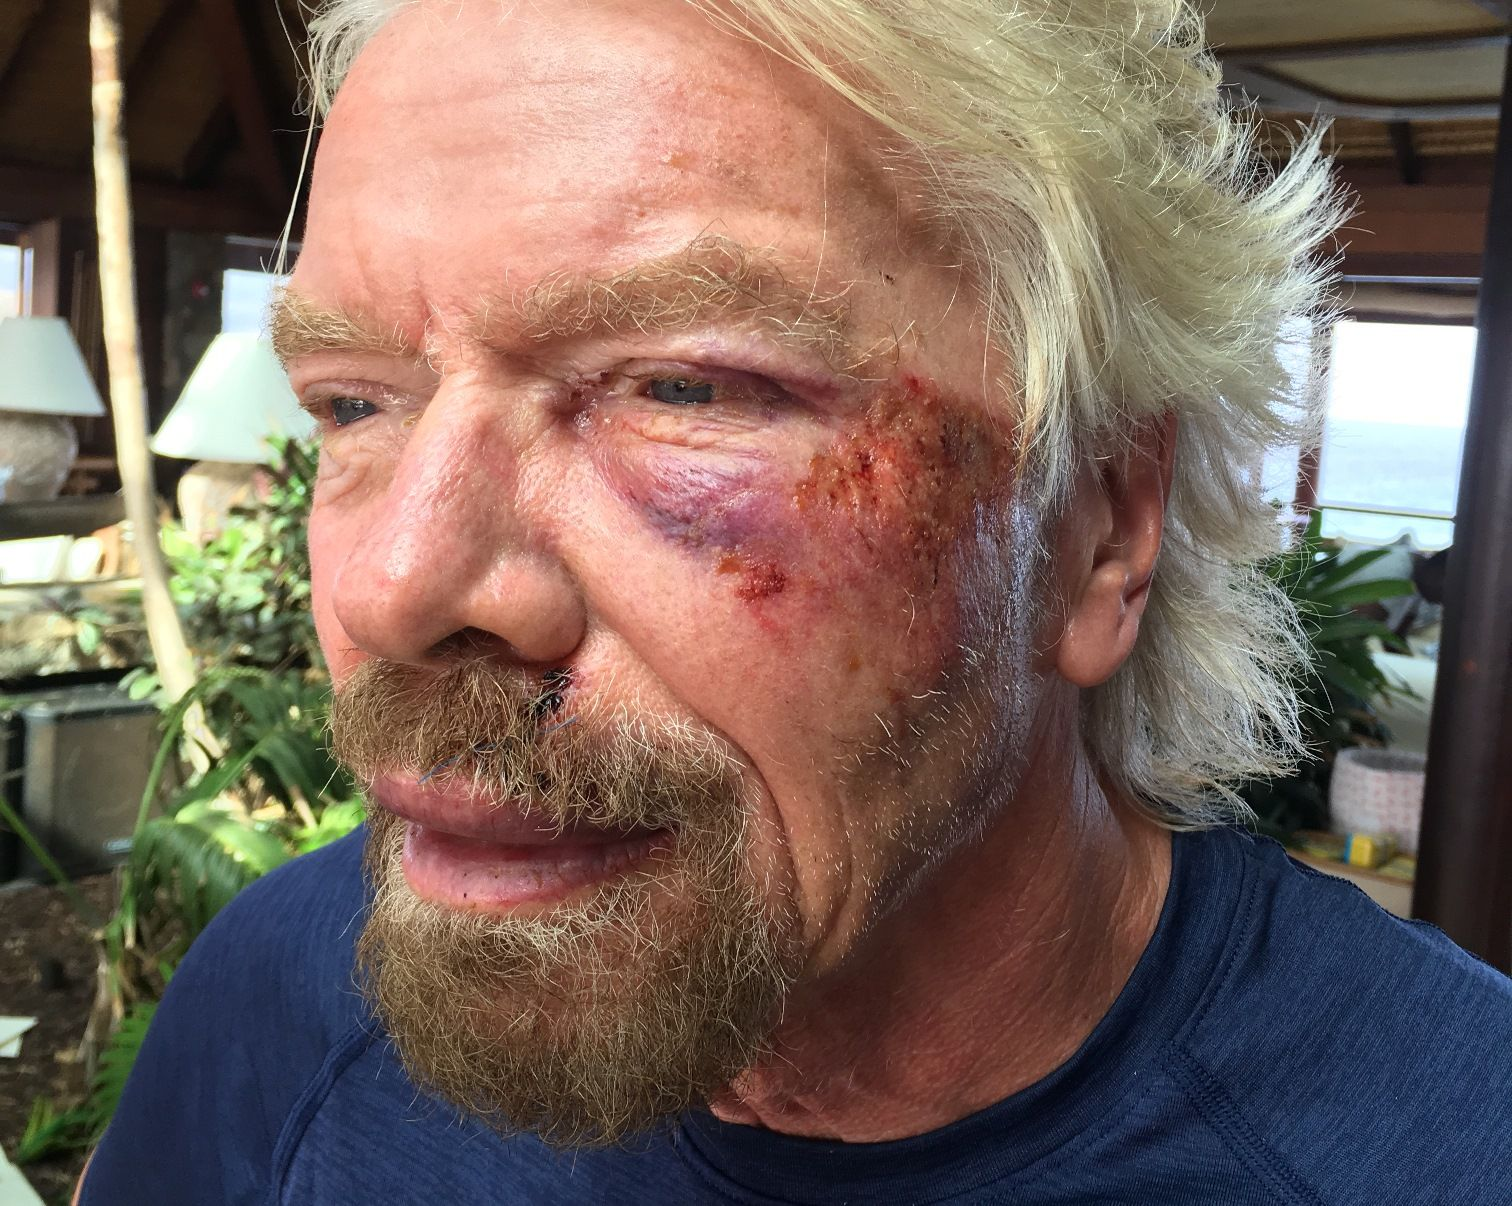 Richard Branson bike crash injury wound